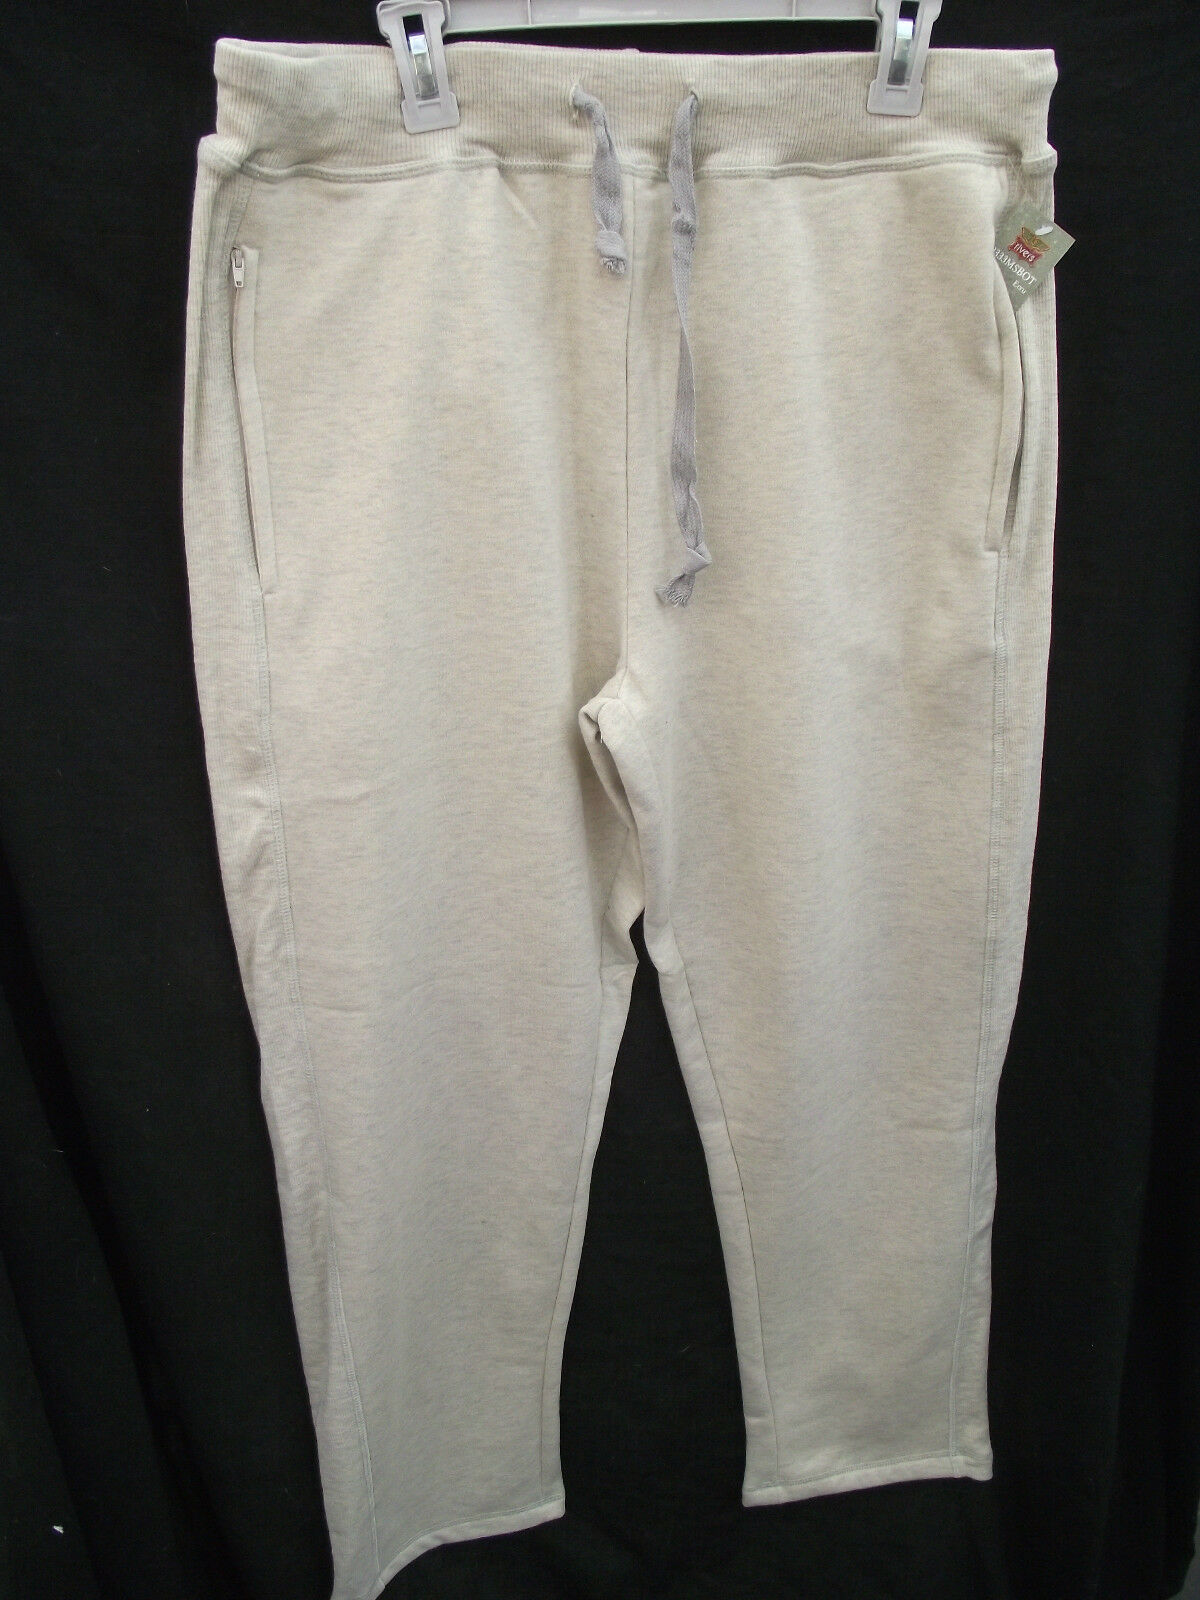 BNWT Men Sz X Large Rivers Cream Marle Straight Leg Fleece Lined Track Pants